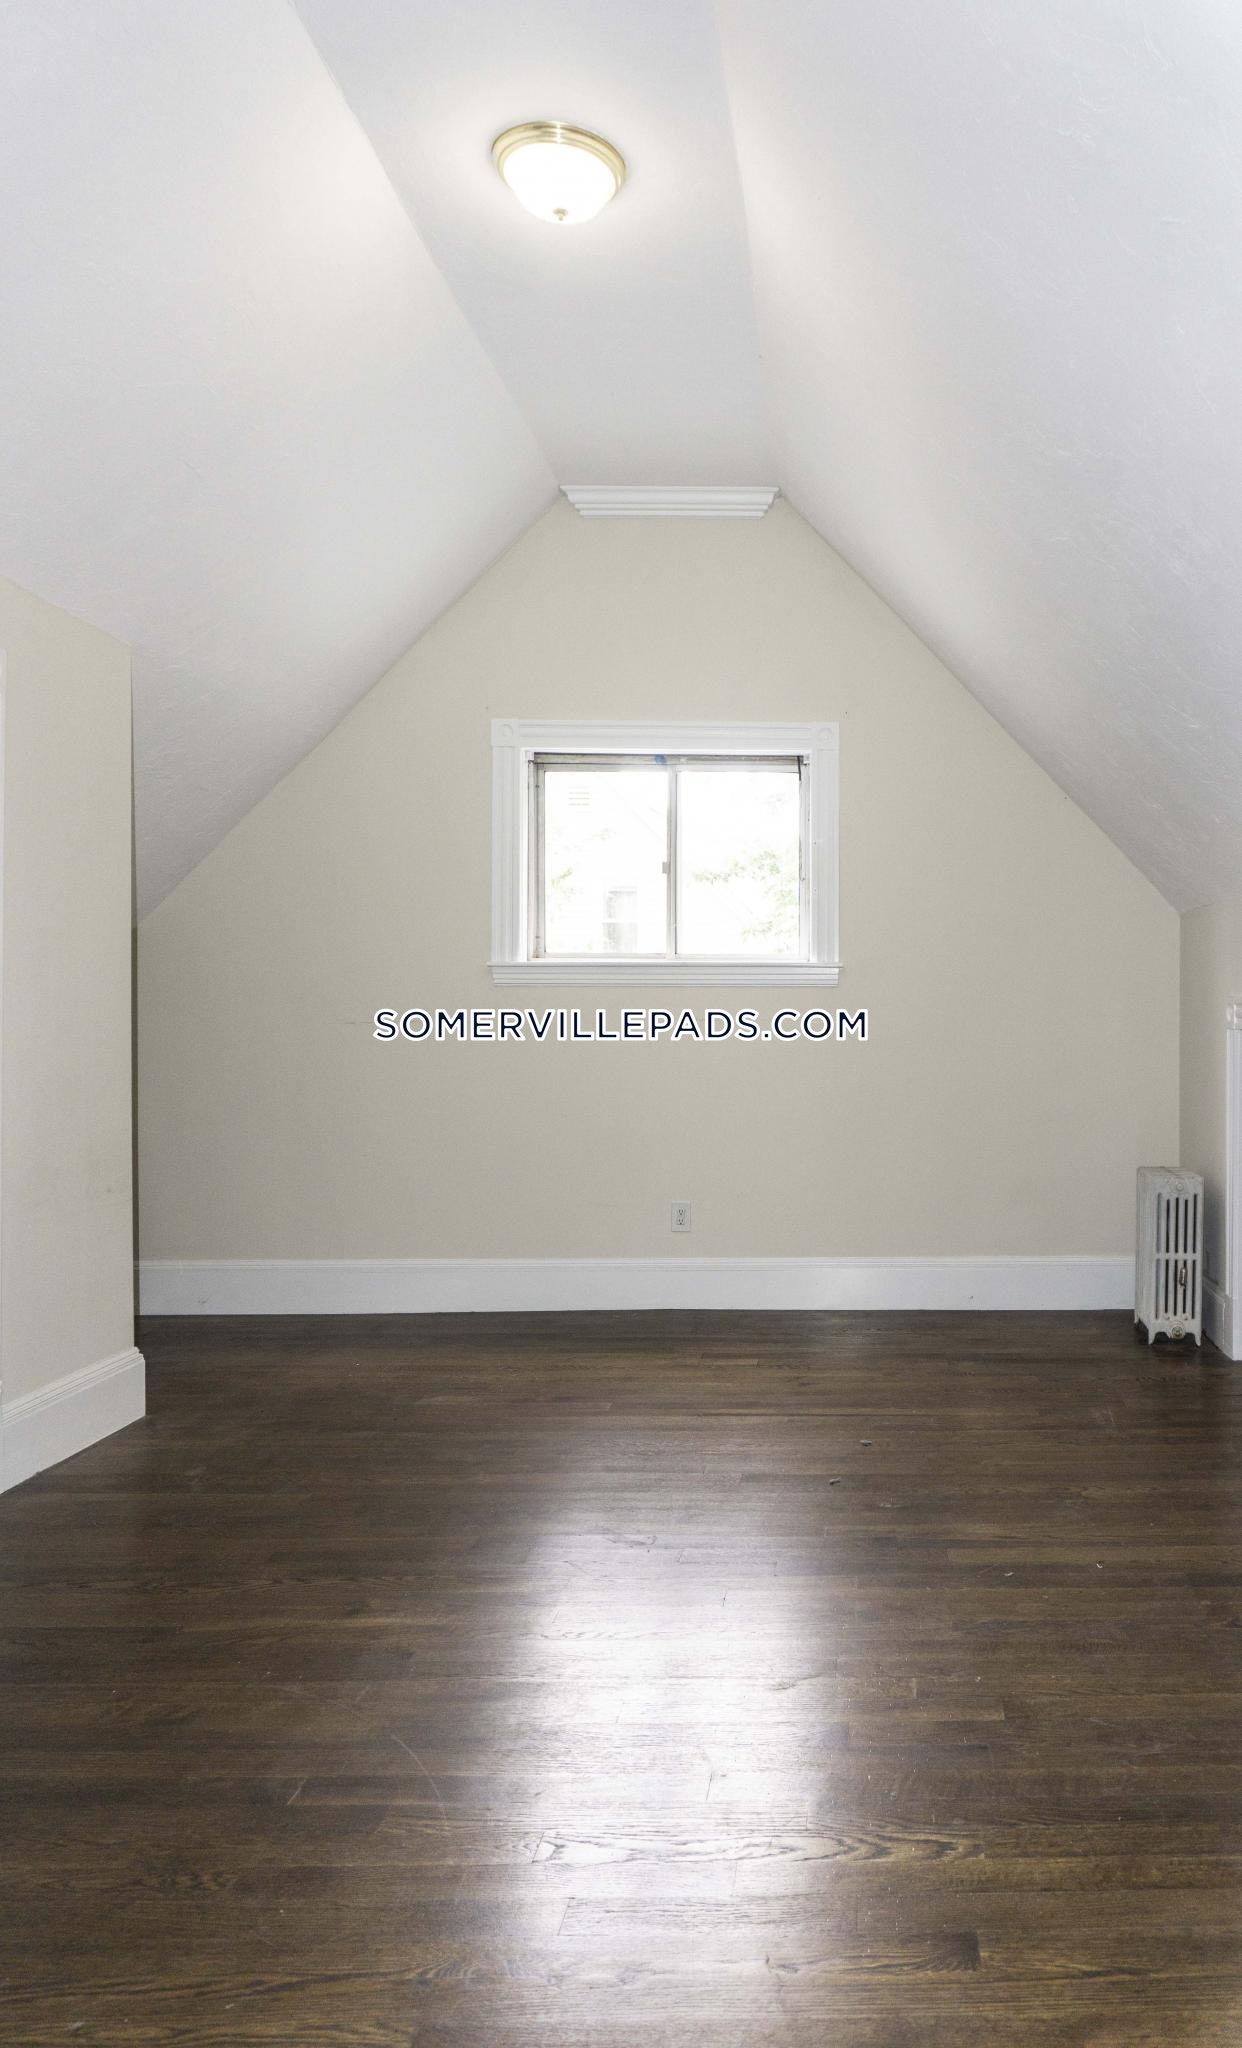 4-beds-1-bath-somerville-spring-hill-3900-450509